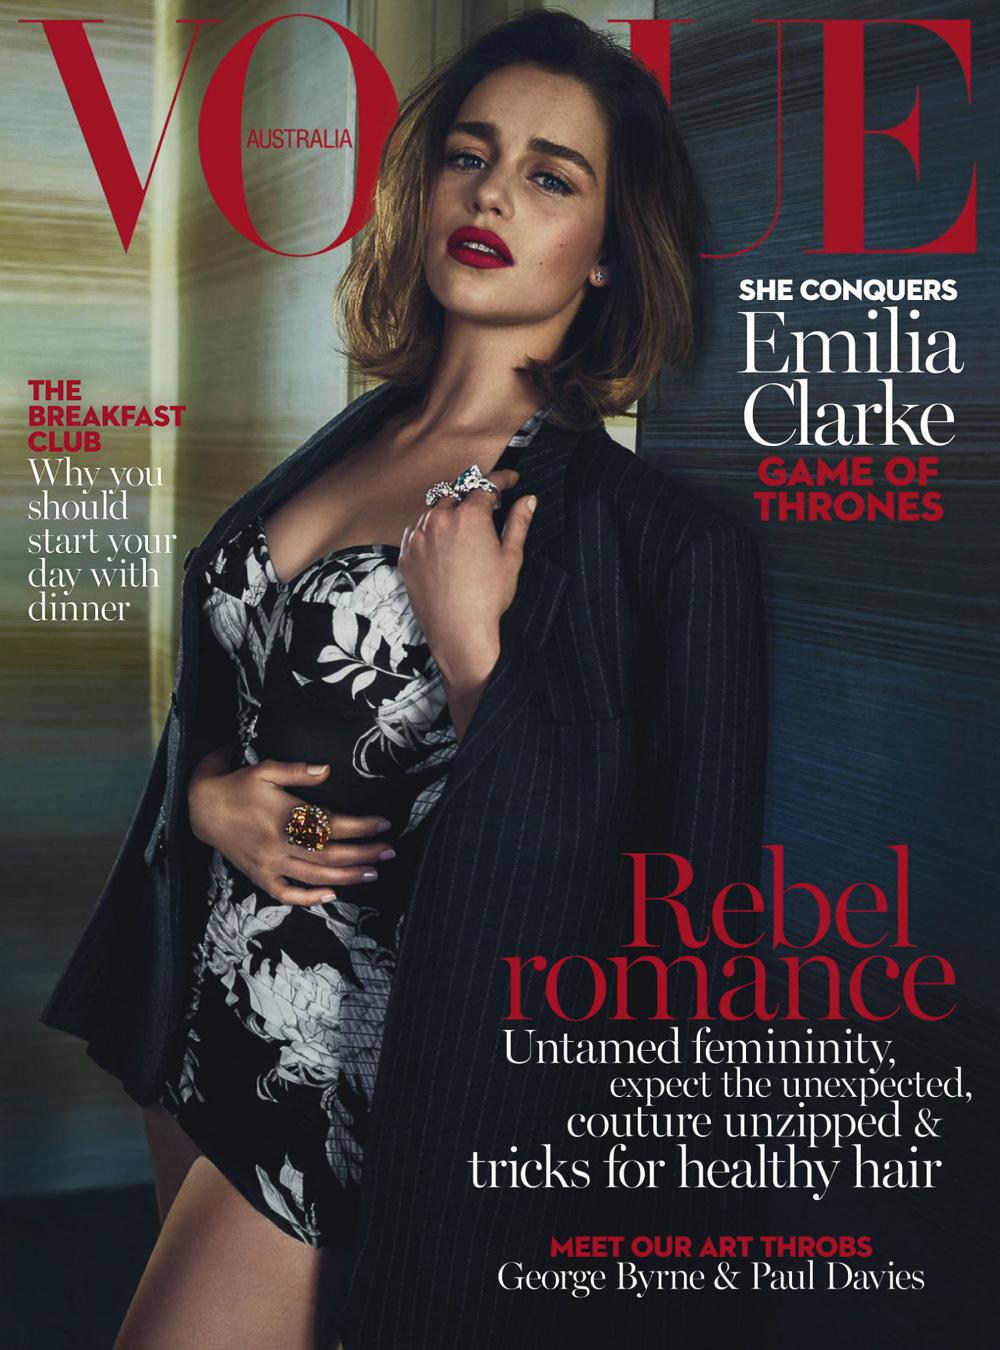 Vogue-Australia-May-2016-Emilia-Clarke-by-Emma-Summerton-1